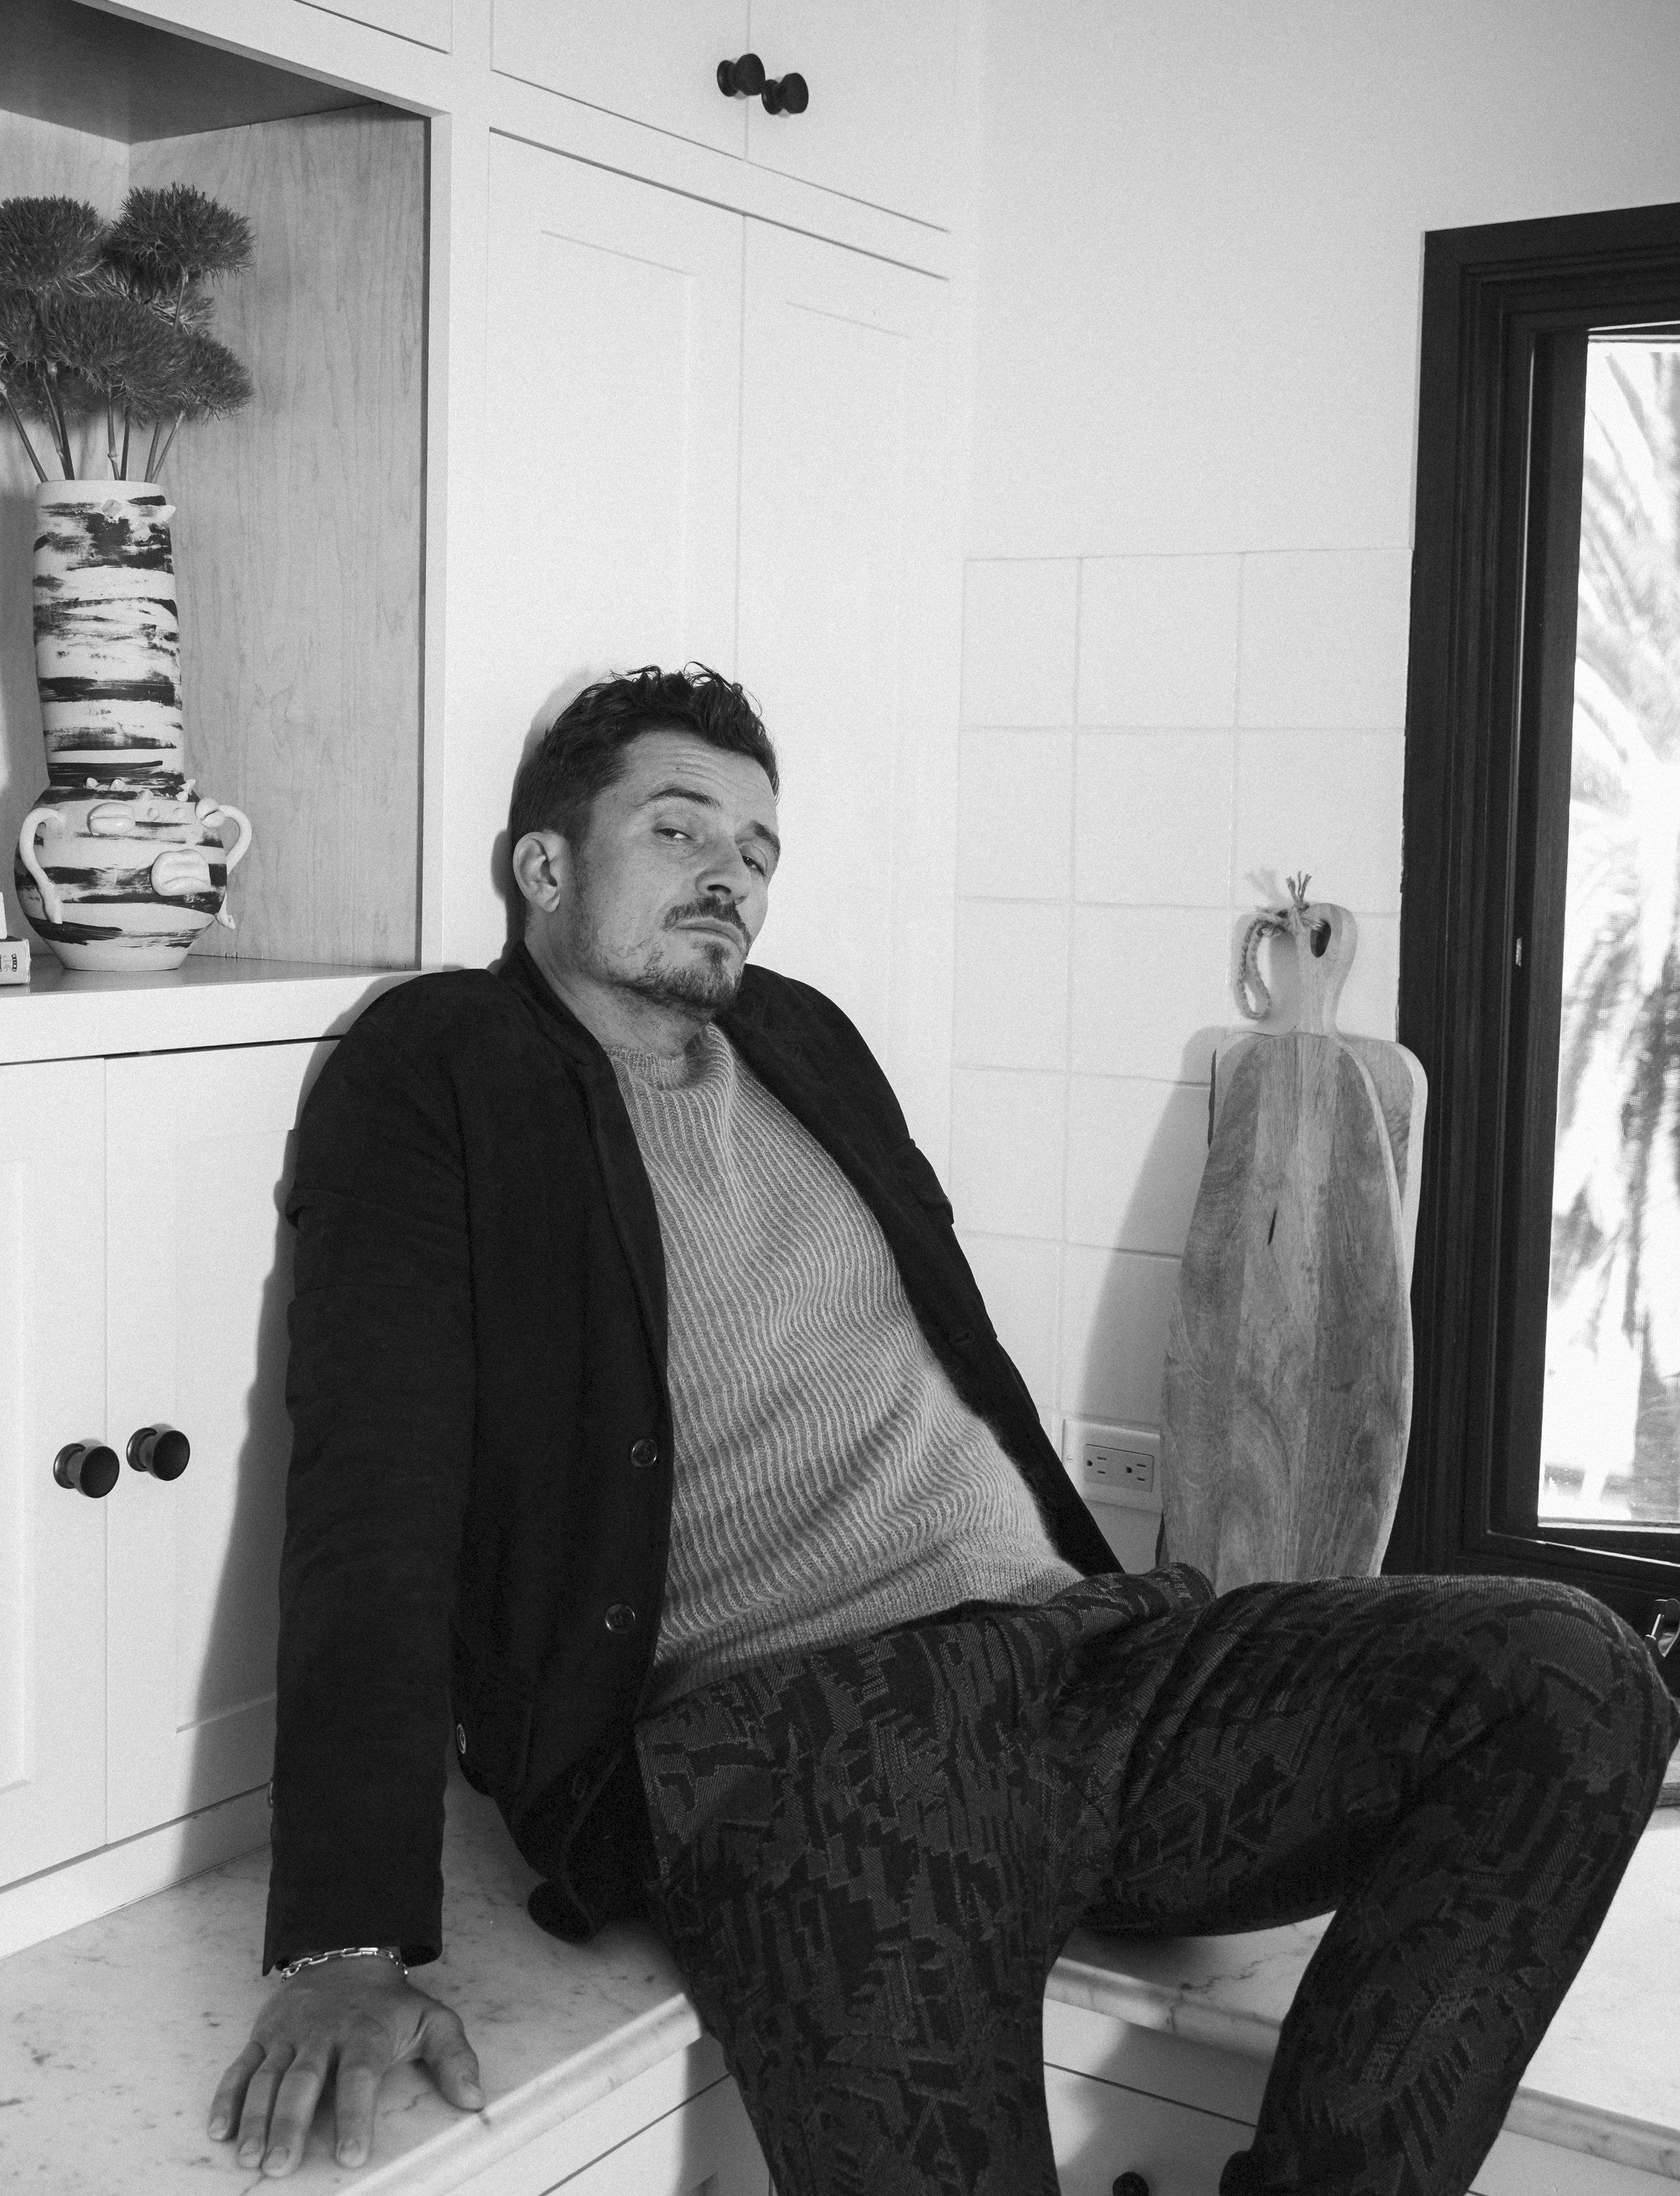 BRUNO MAGLI     blazer,   SALVATORE FERRAGAMO     sweater, and   ERMENEGILDO ZEGNA     pants.